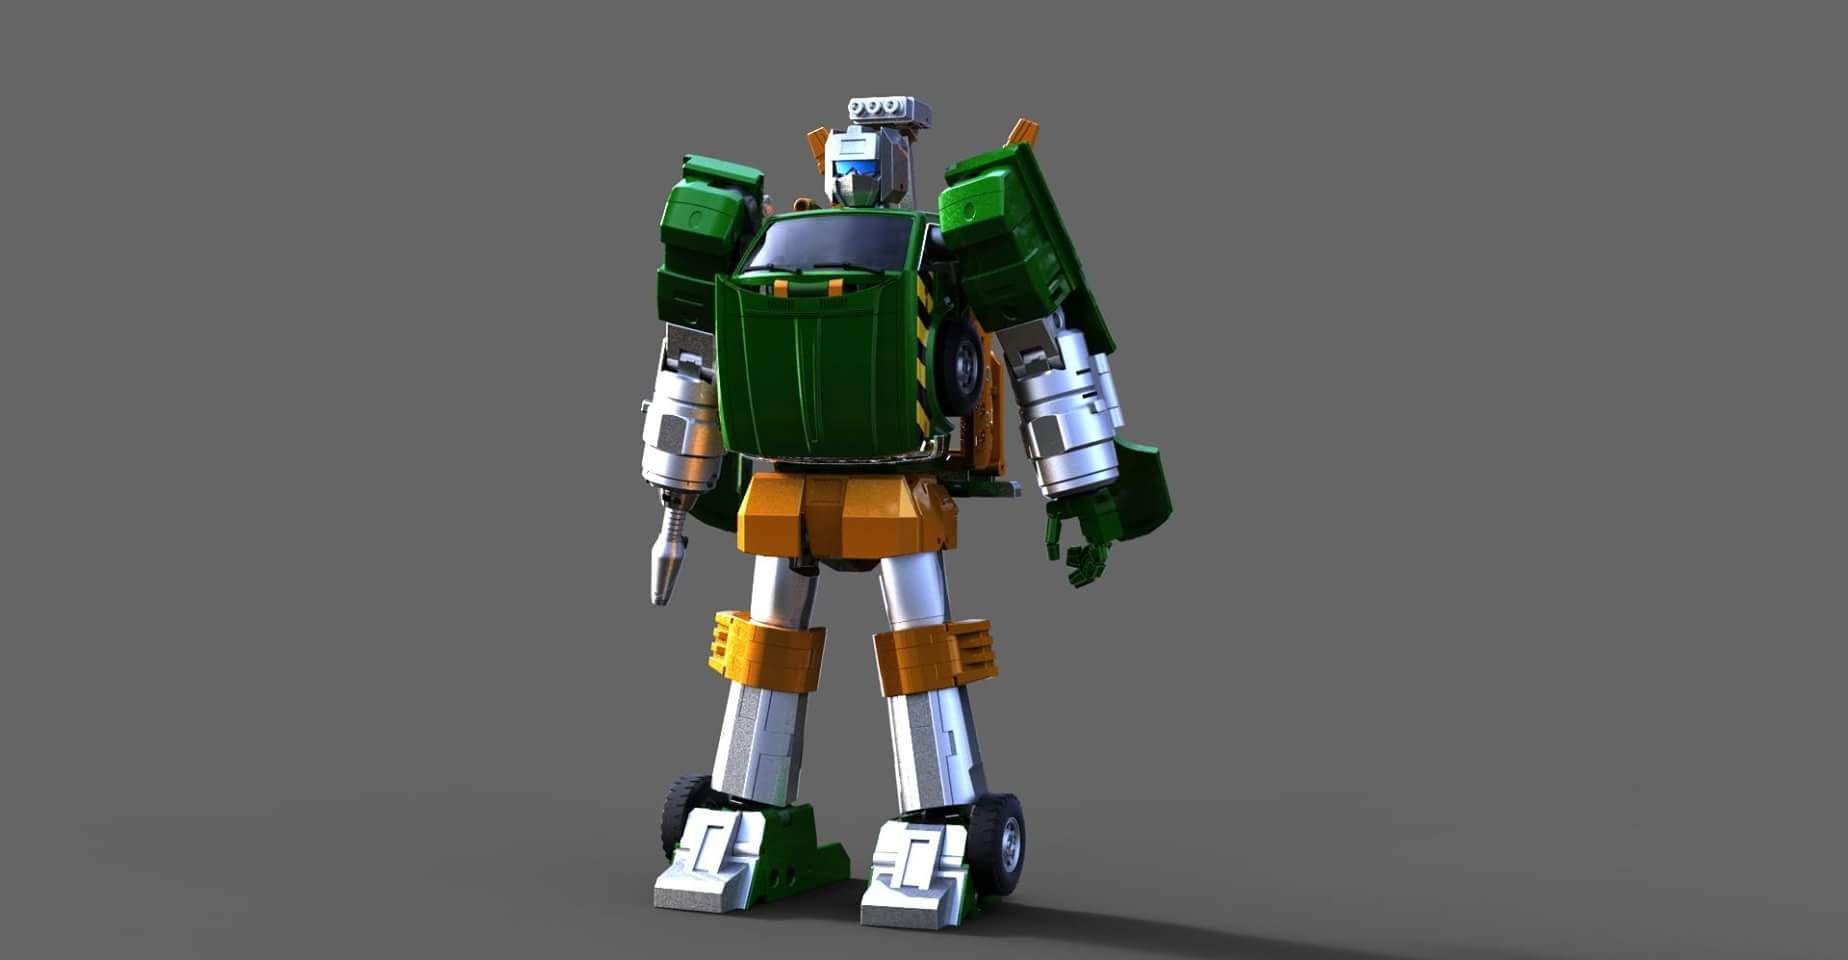 [X-Transbots] Produit Tiers - Jouet MX-X Paean - aka Hoist/Treuil M35hRlJ9